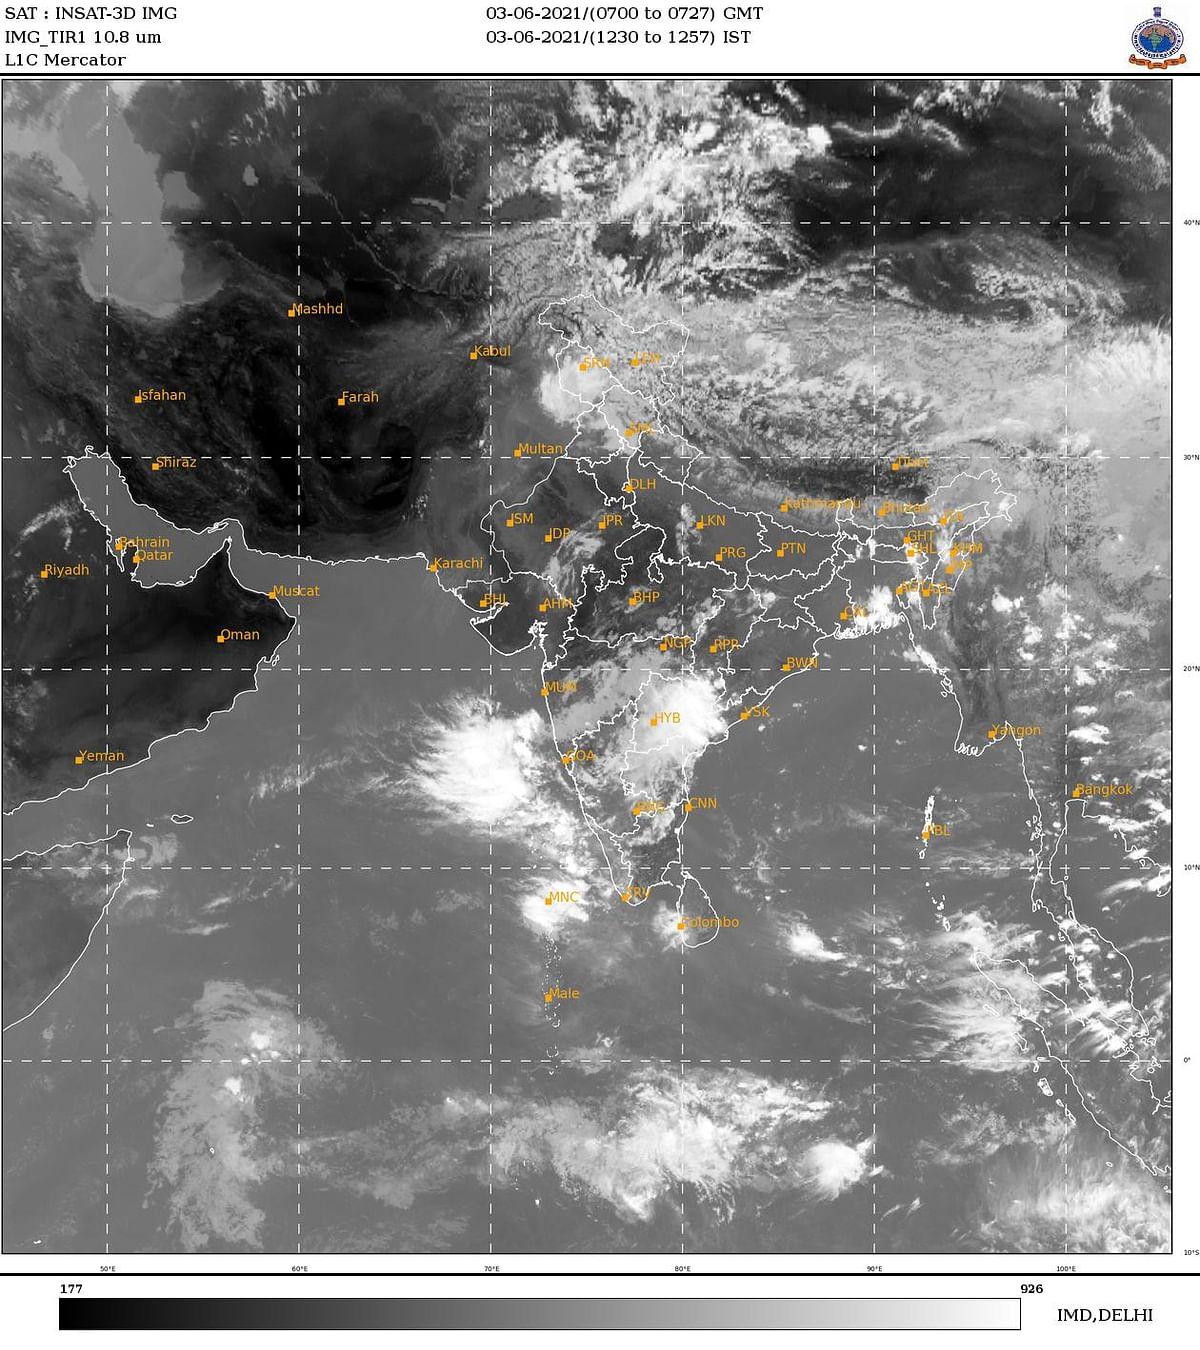 SouthWest monsoon sets in over Kerala